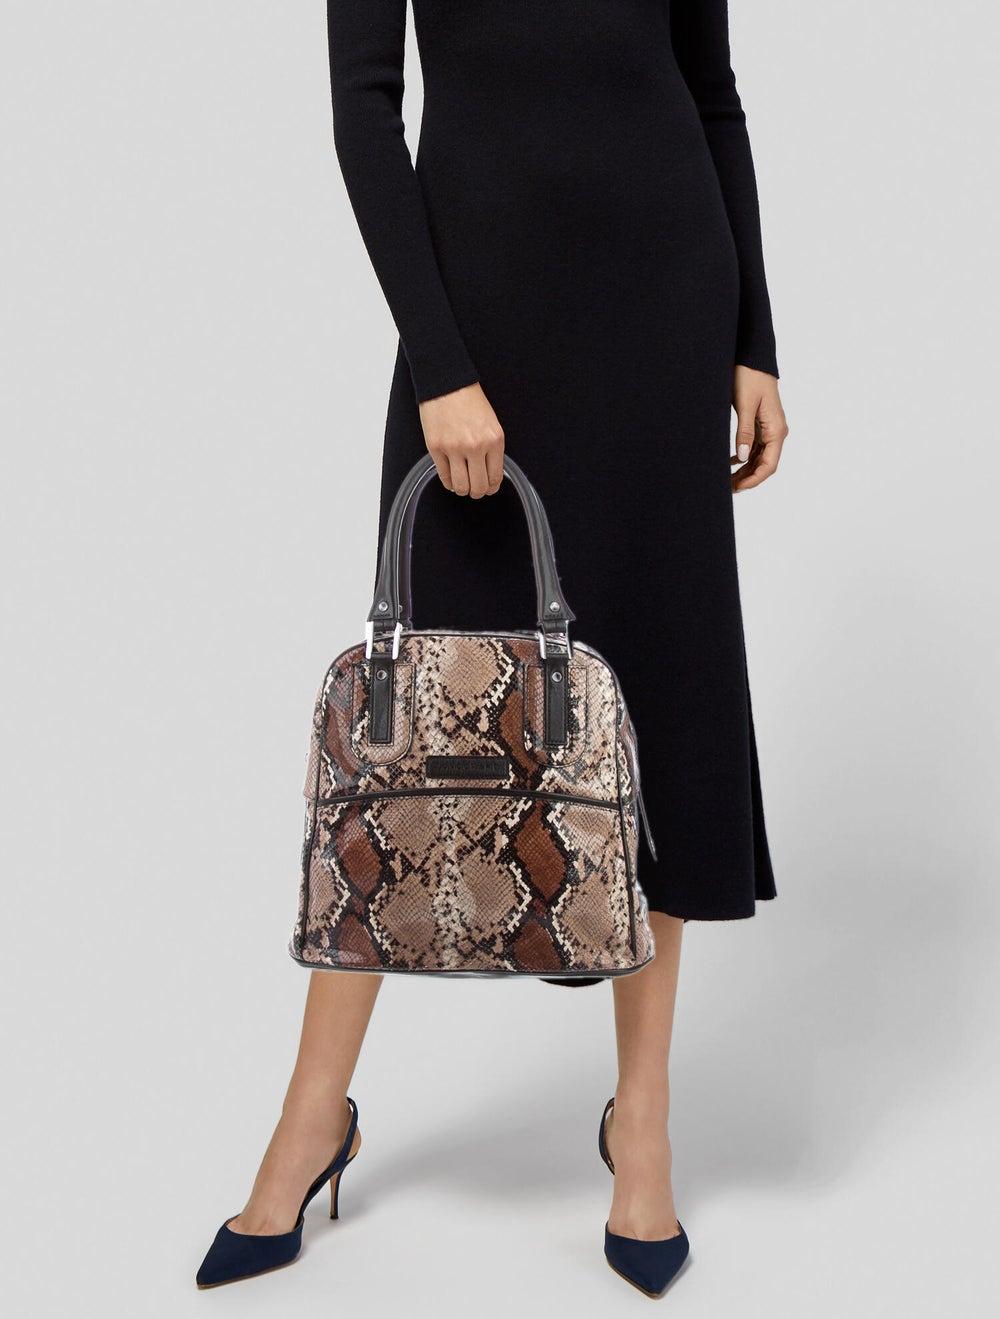 Longchamp Python Leather Tote Brown - image 2